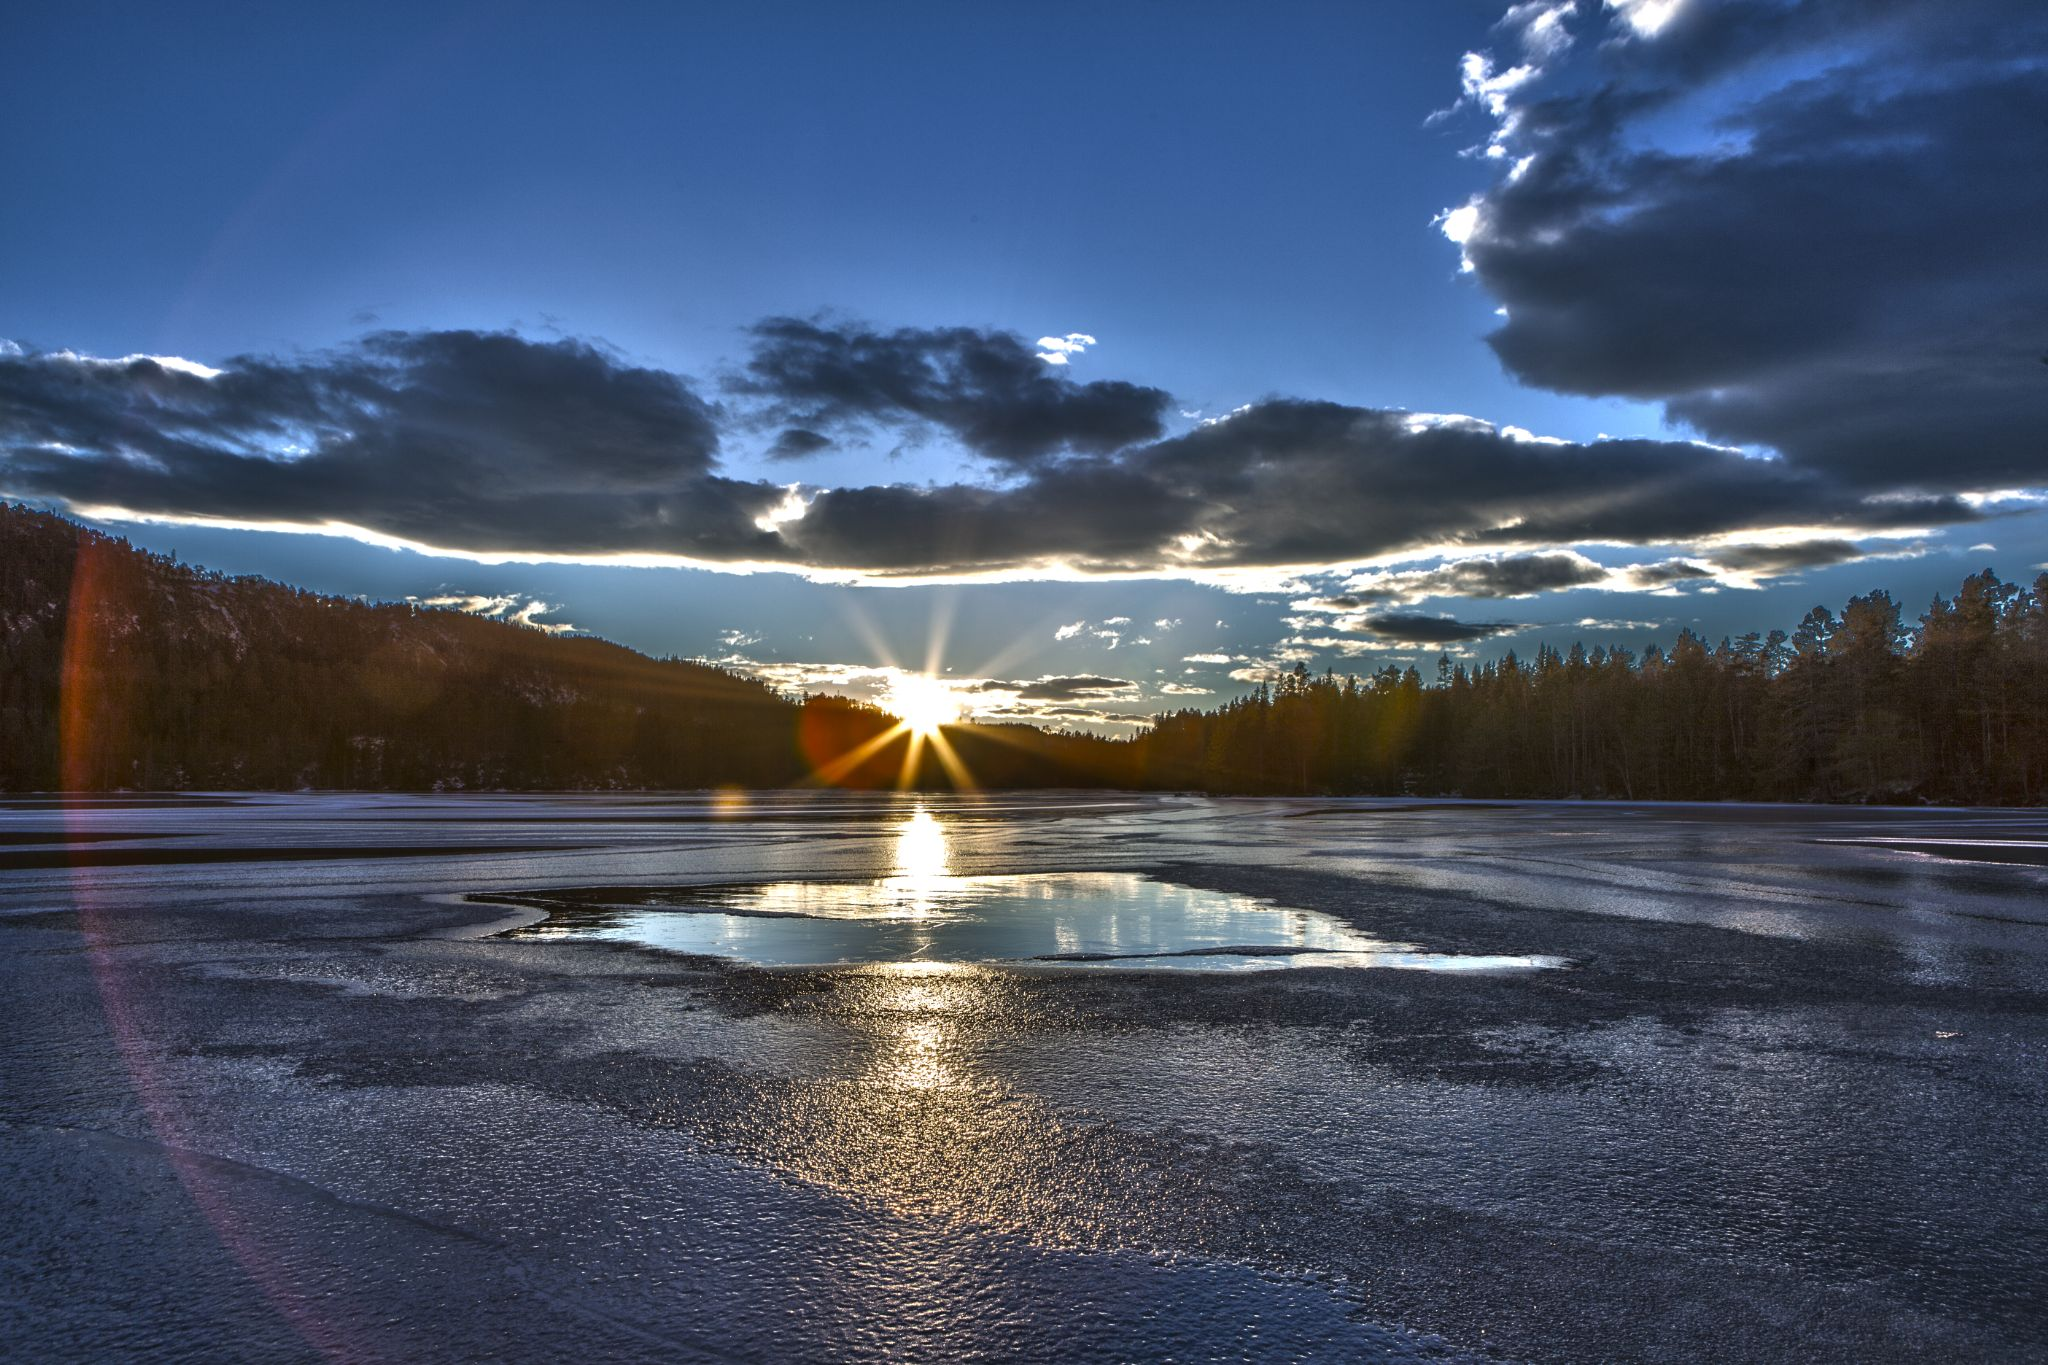 Sunrise & sunset by Odd Rune Wang